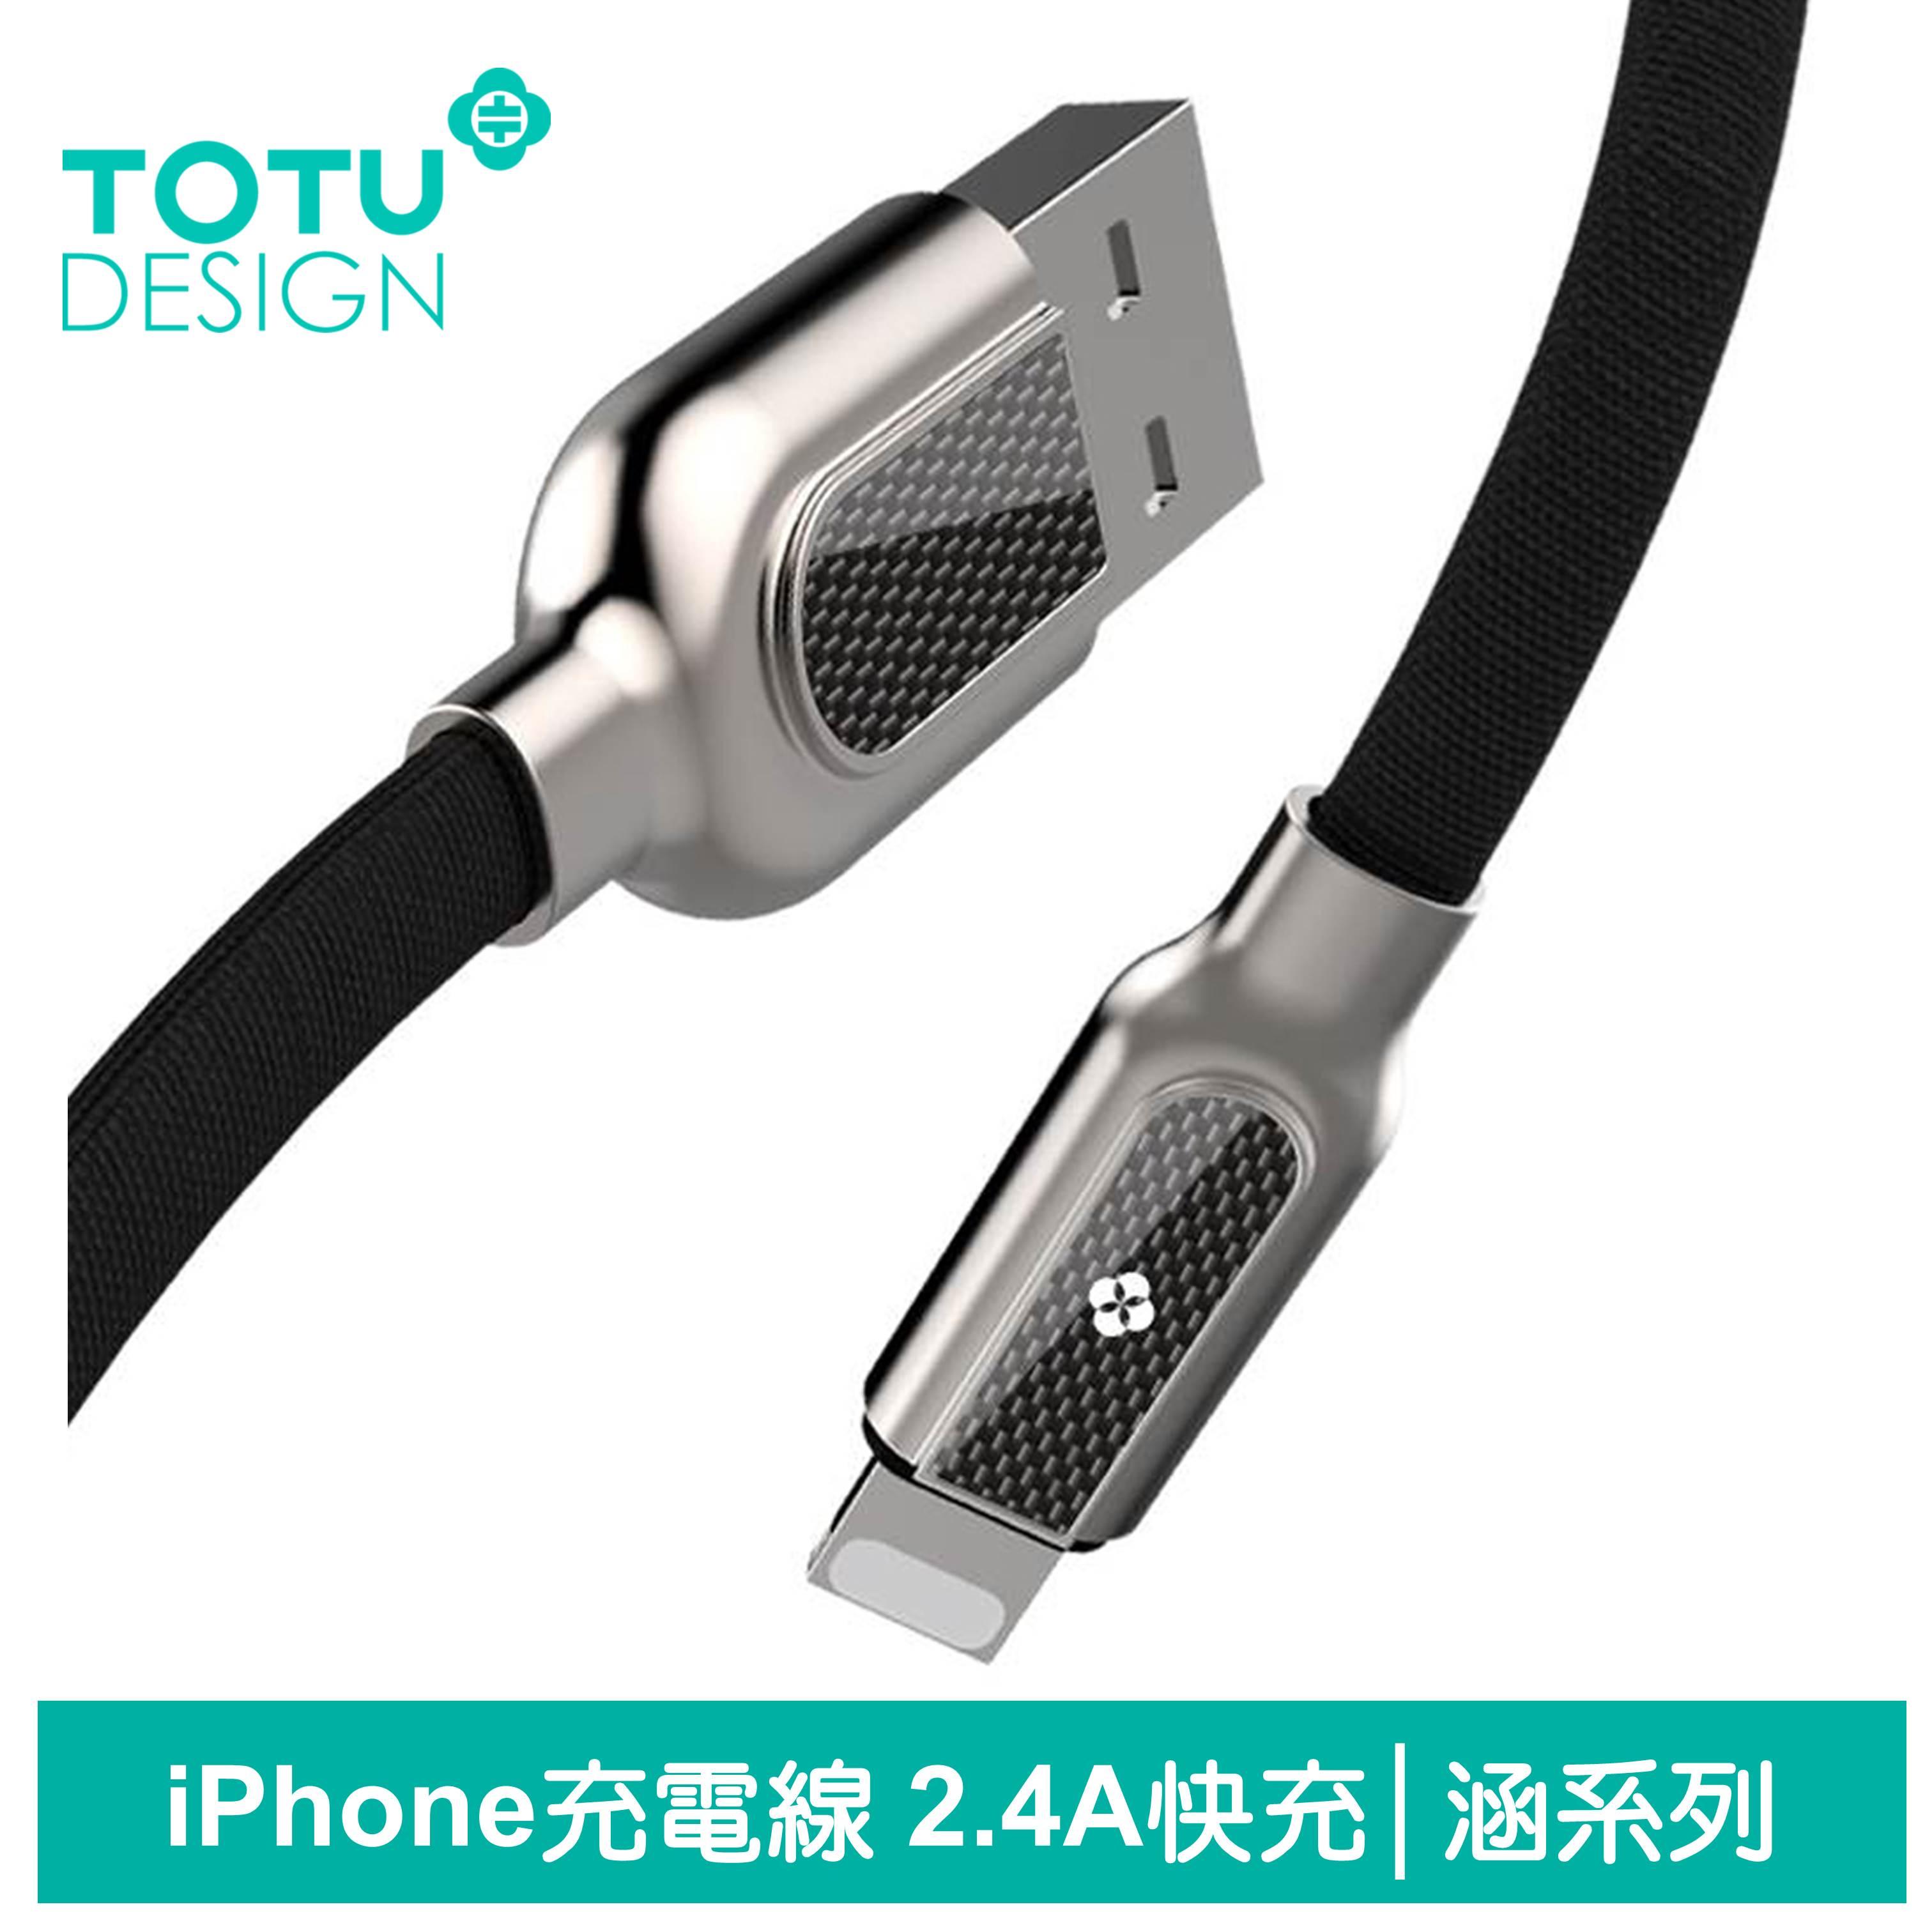 TOTU台灣官方 iPhone/Lightning充電線傳輸線 鋅合金 2.4A快充 涵系列 120cm 黑色